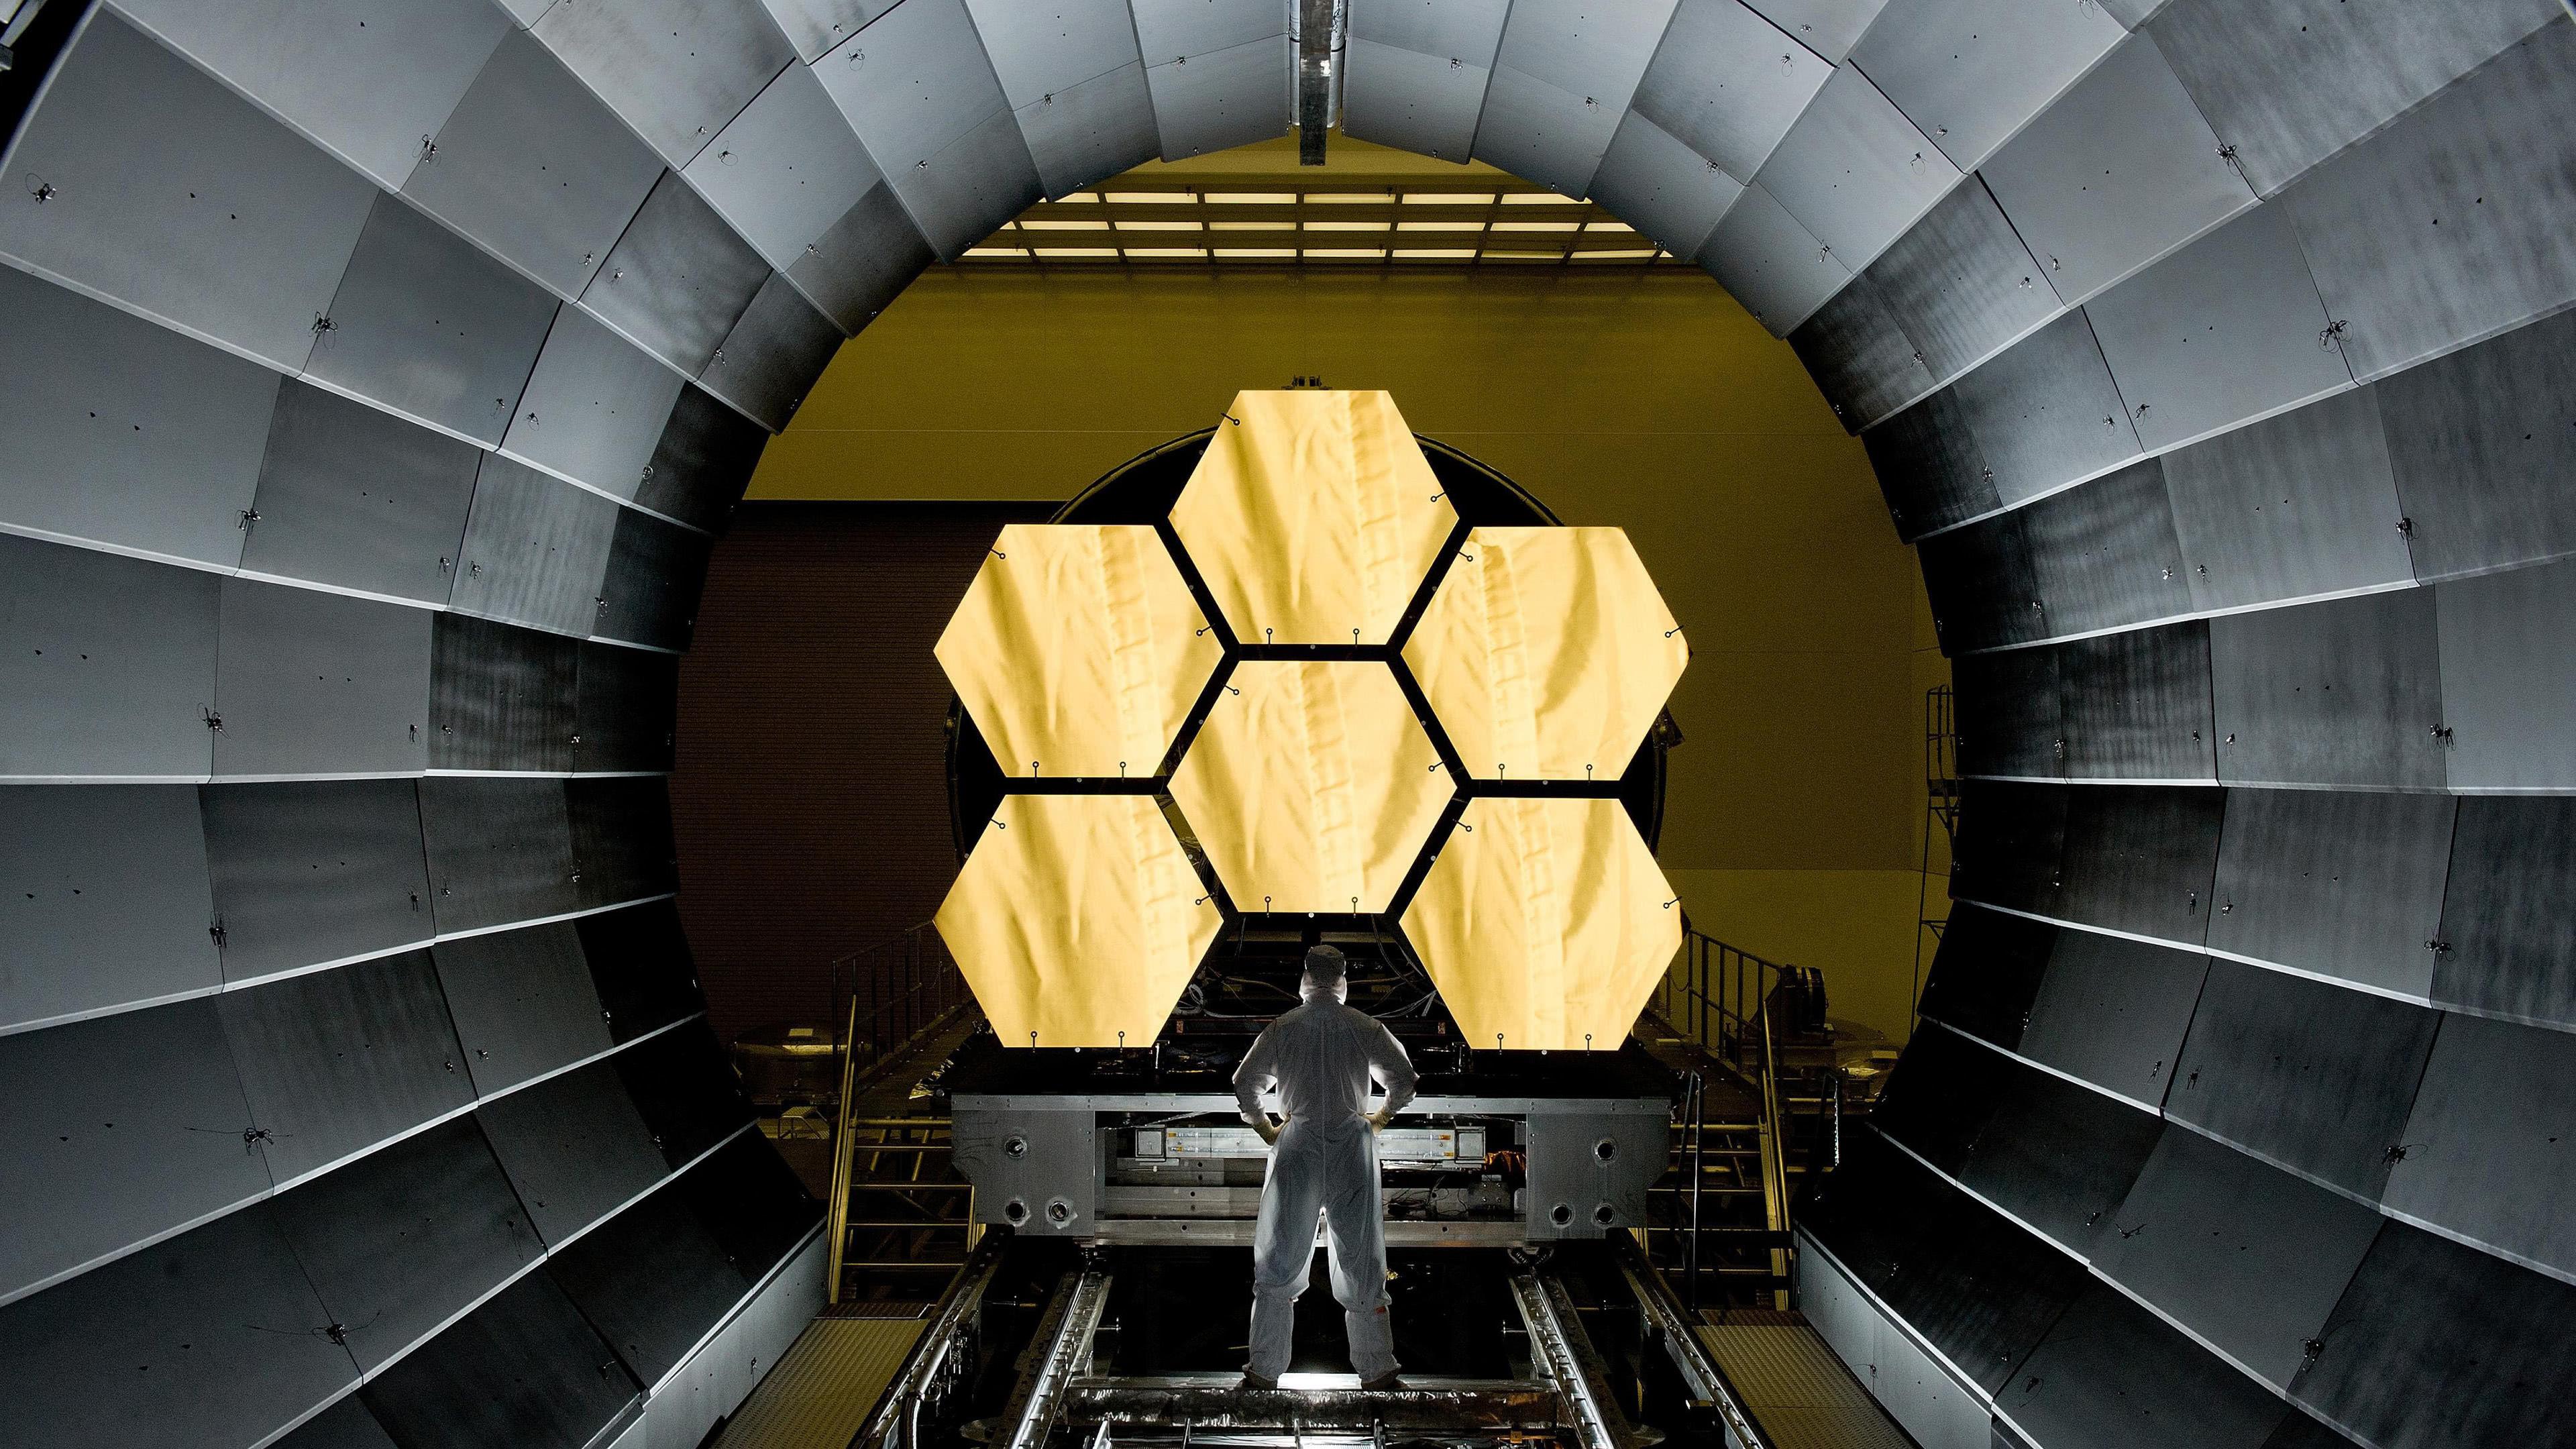 james webb space telescope uhd 4k wallpaper